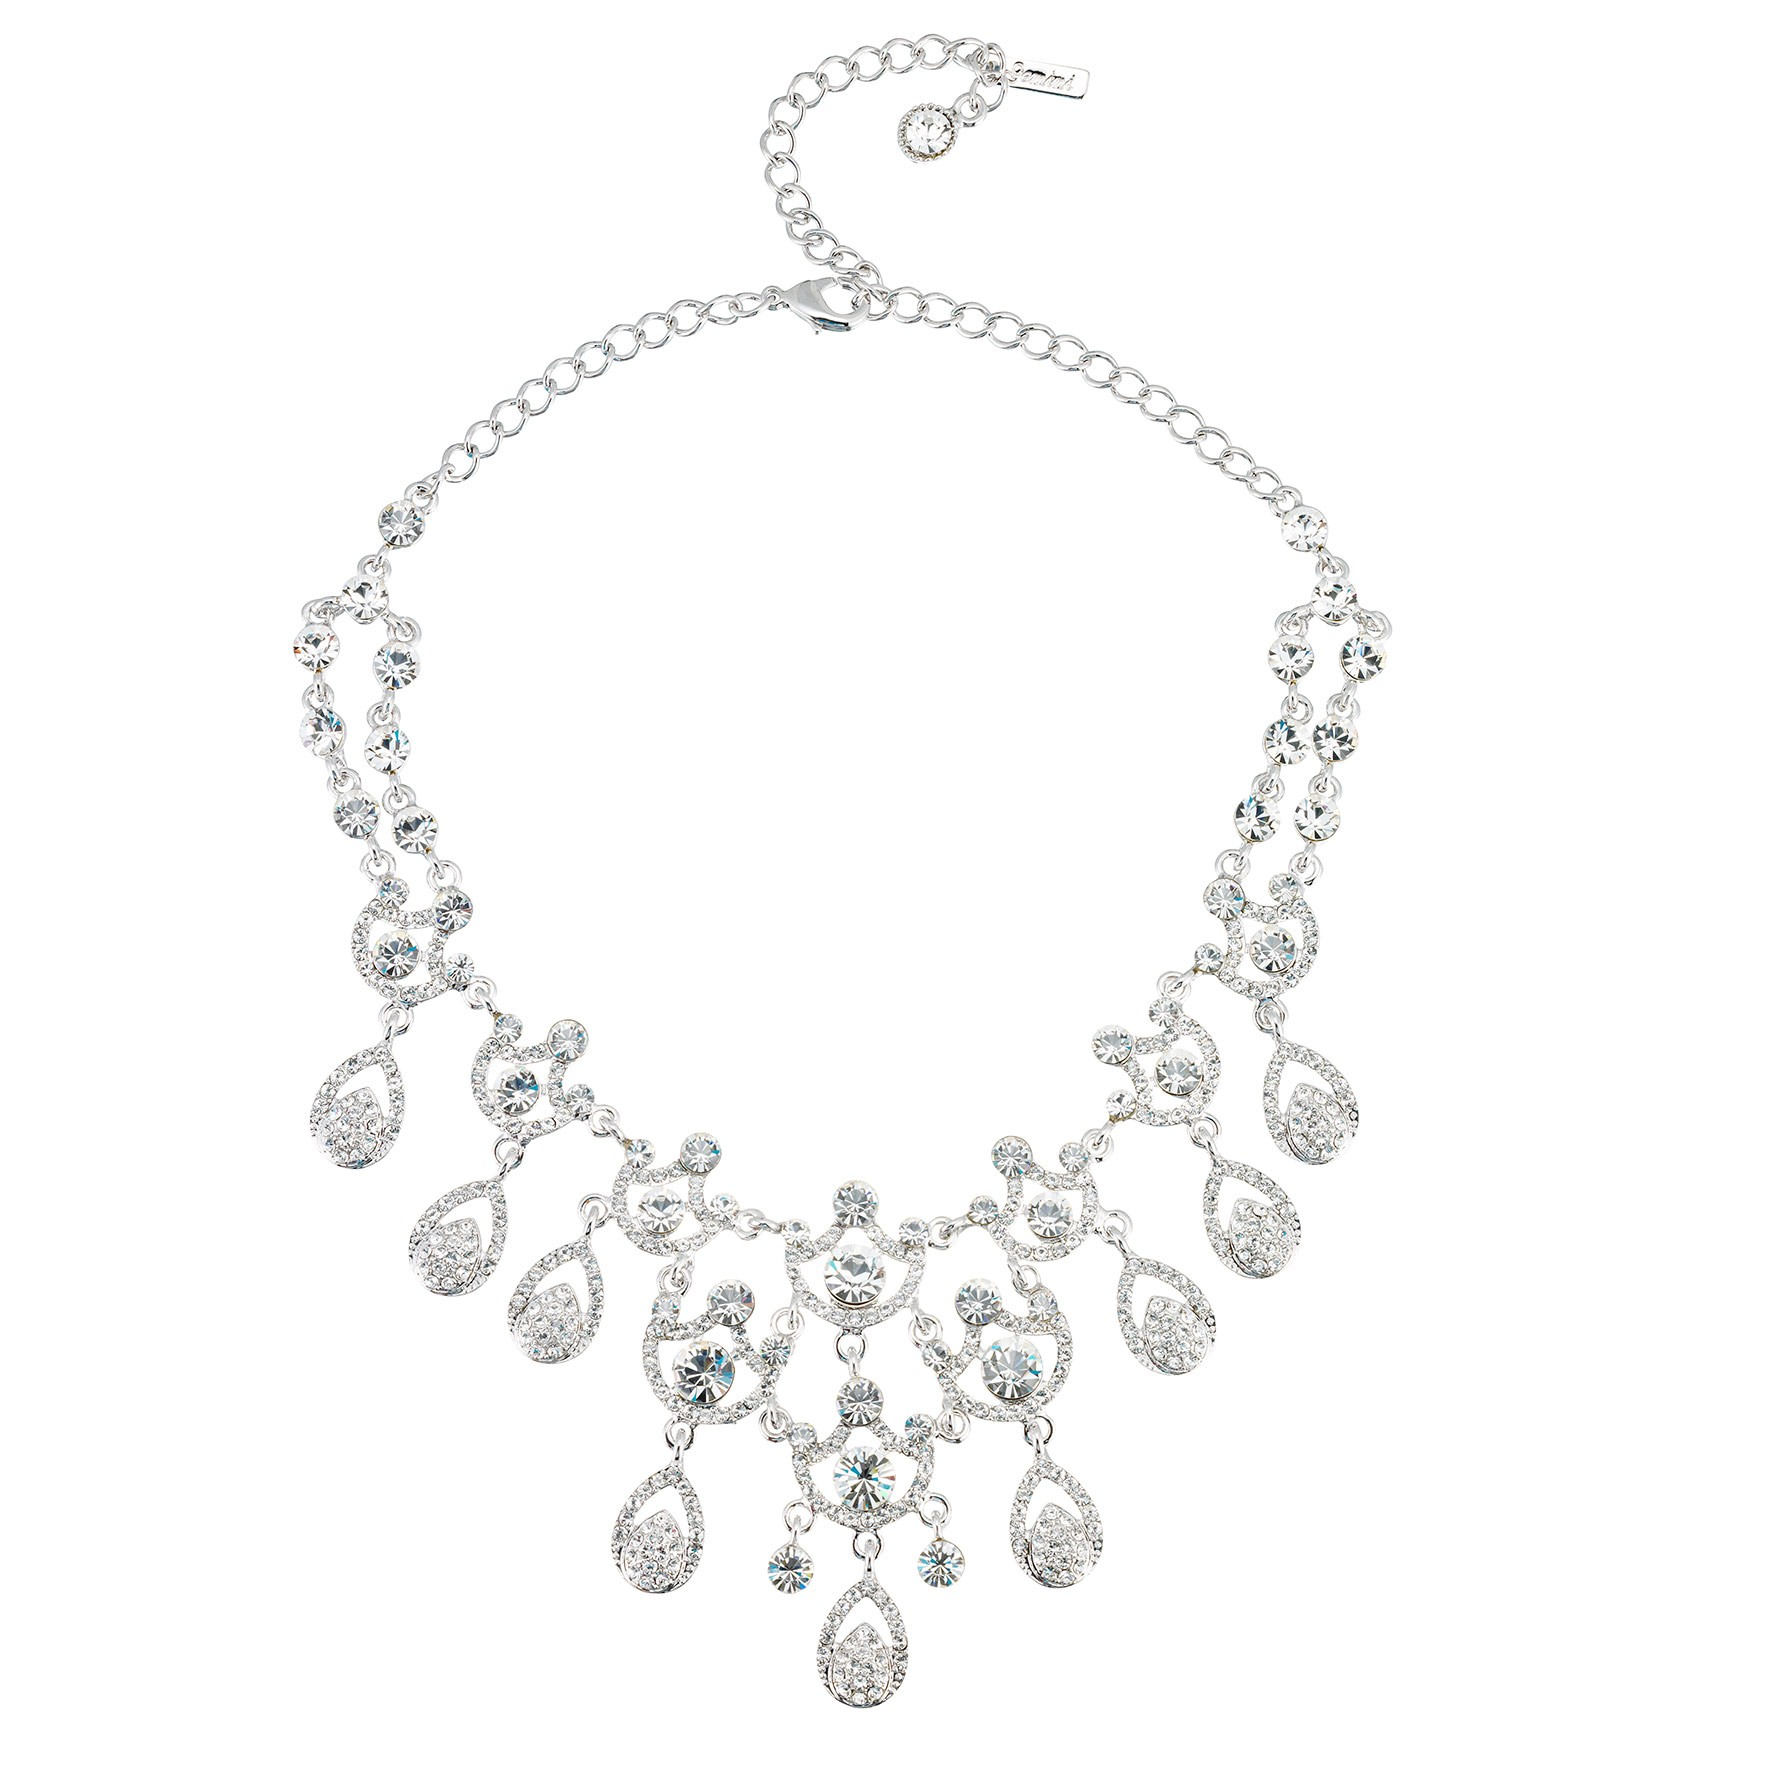 1772x1772 Swarovski Crystal Clear Crystal Necklace 9 Ornate Chandelier